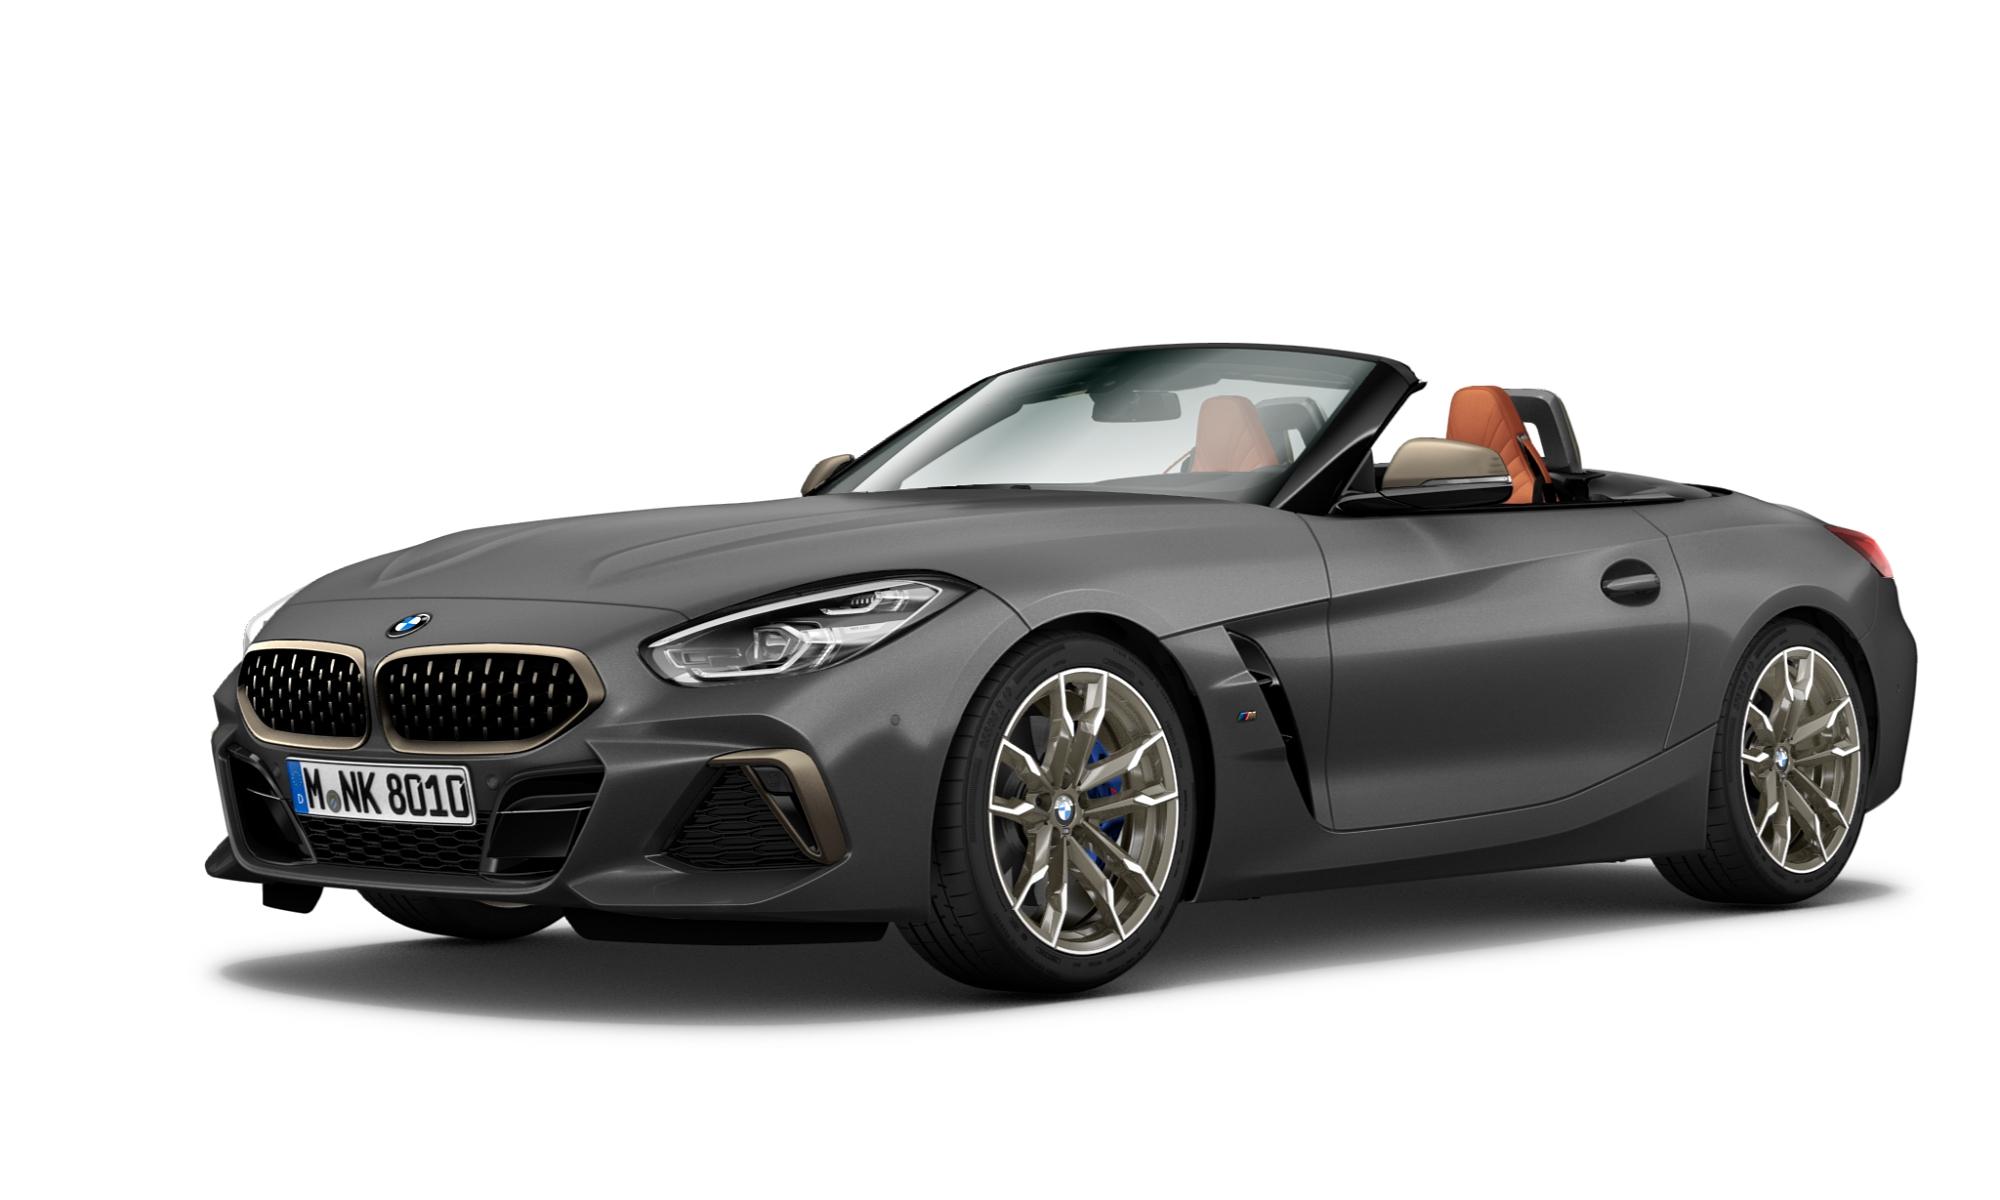 BMW PH Unveils New Variants Of 5 Series, X3, Z4 - News